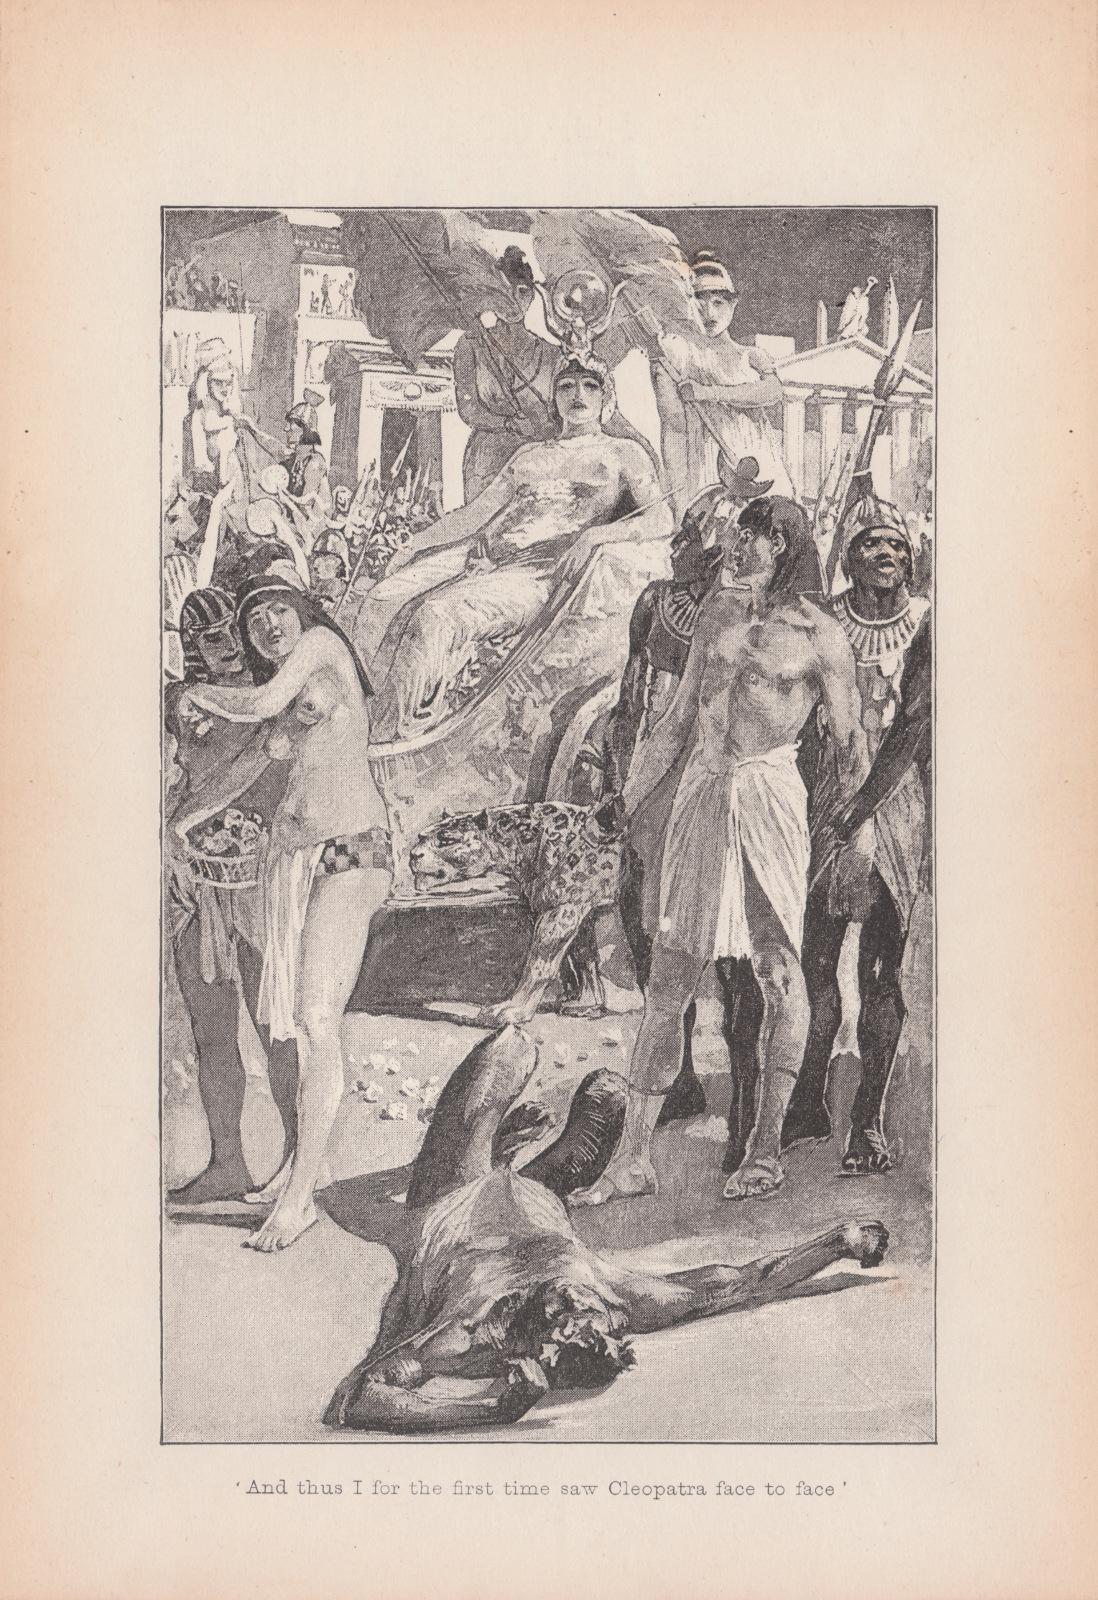 Andthus188990